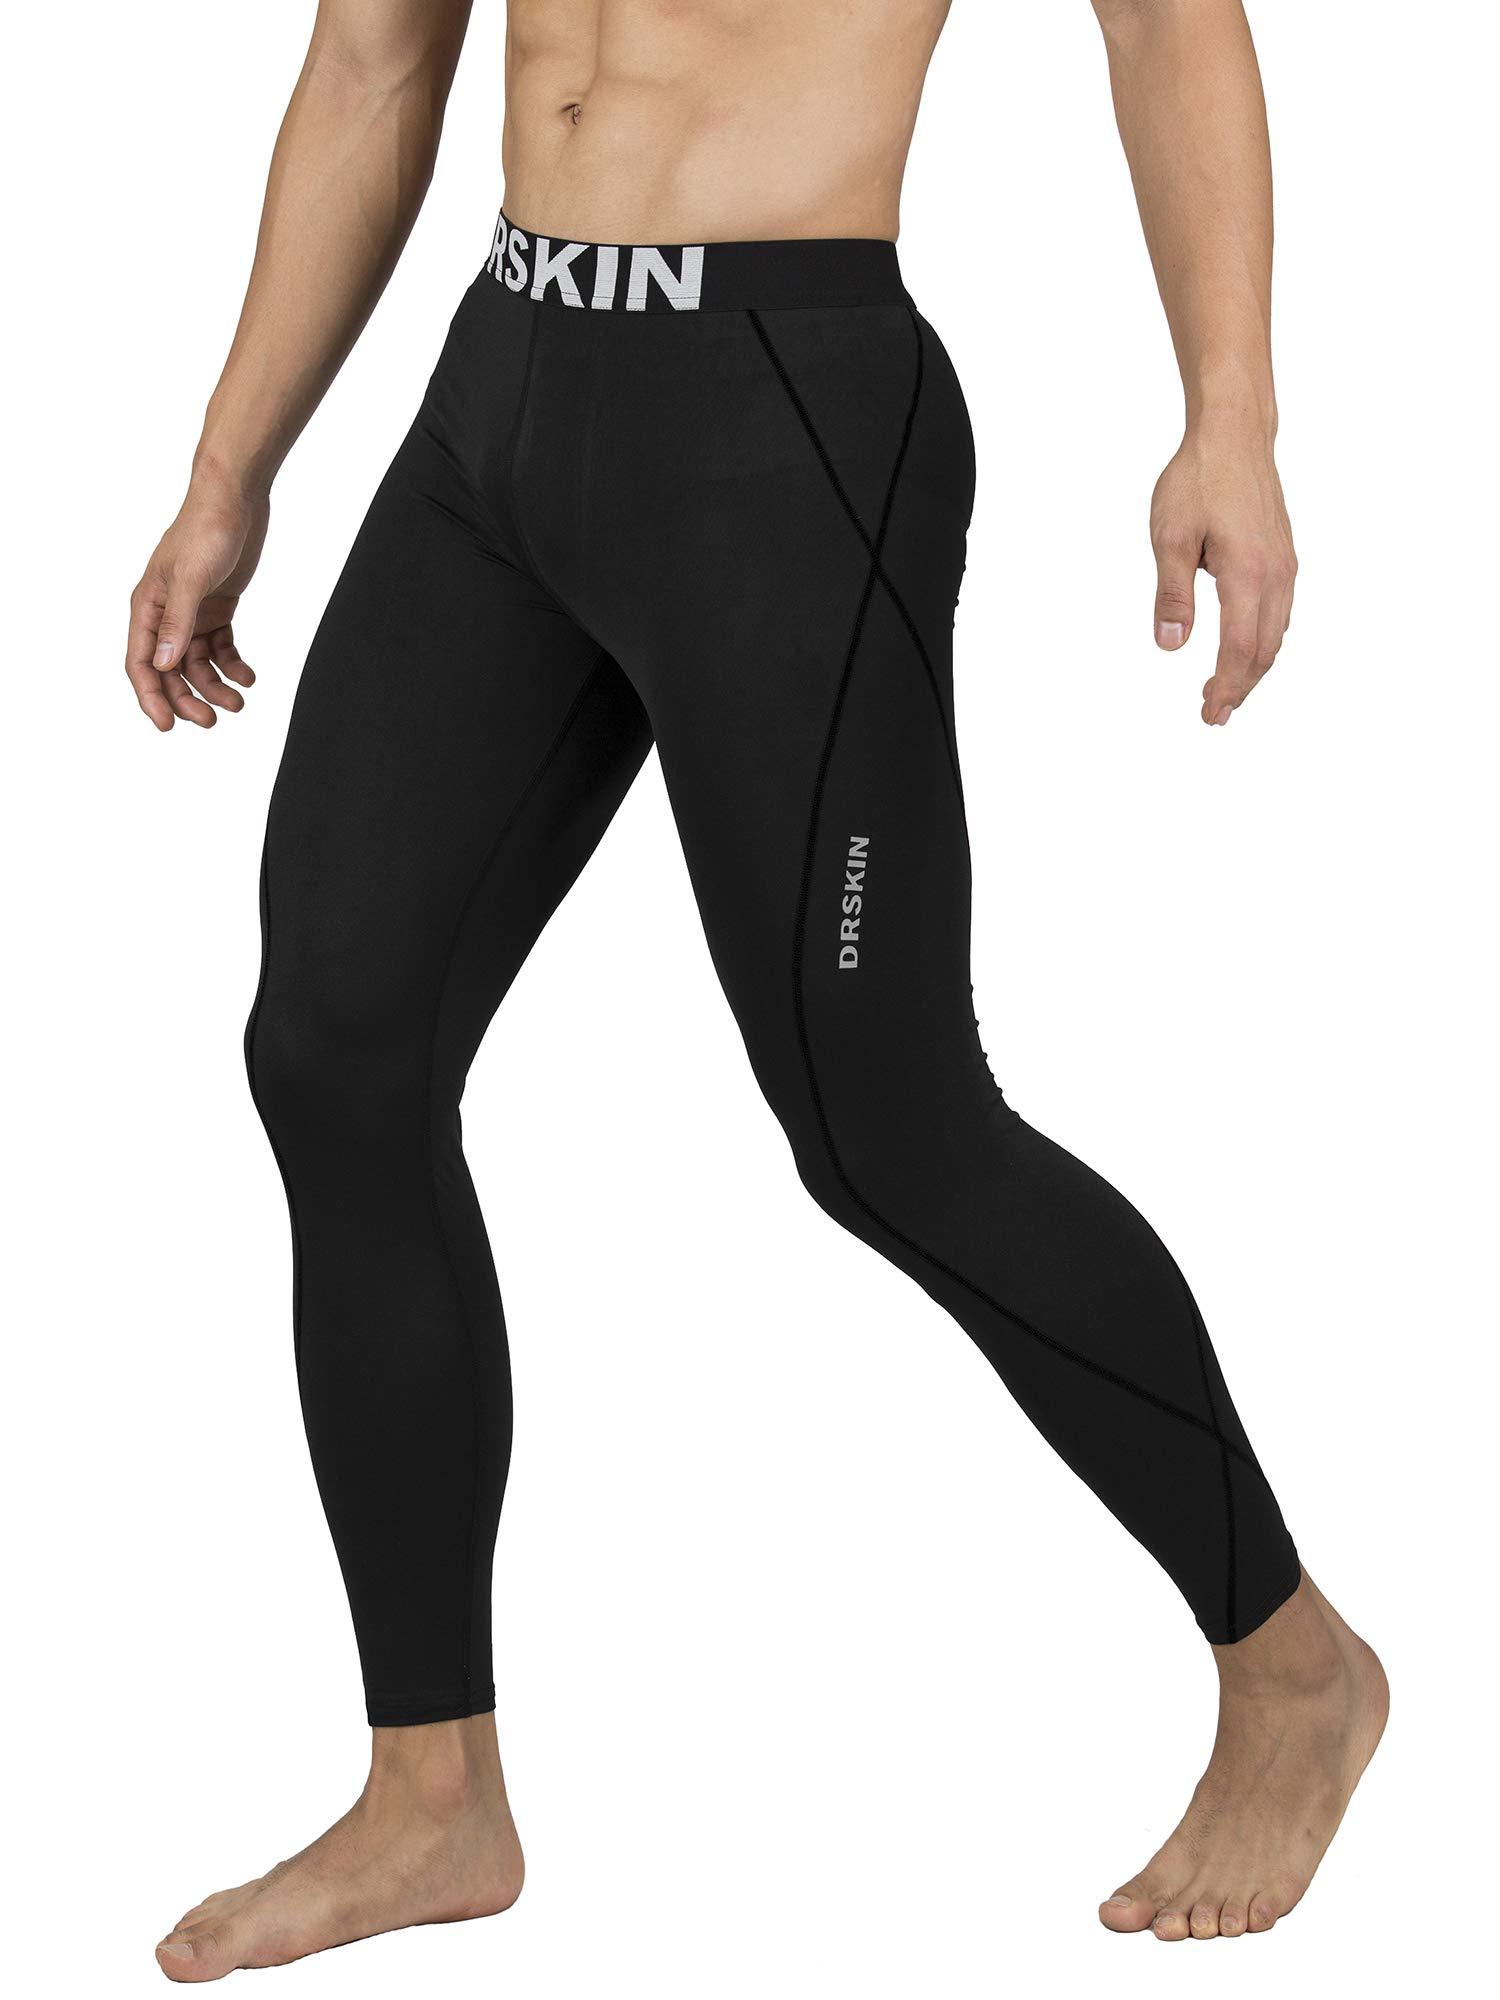 d461d913df5aa9 Galleon - DRSKIN Compression Cool Dry Sports Tights Pants Baselayer Running  Leggings Yoga Rashguard Men (S, DABB11)